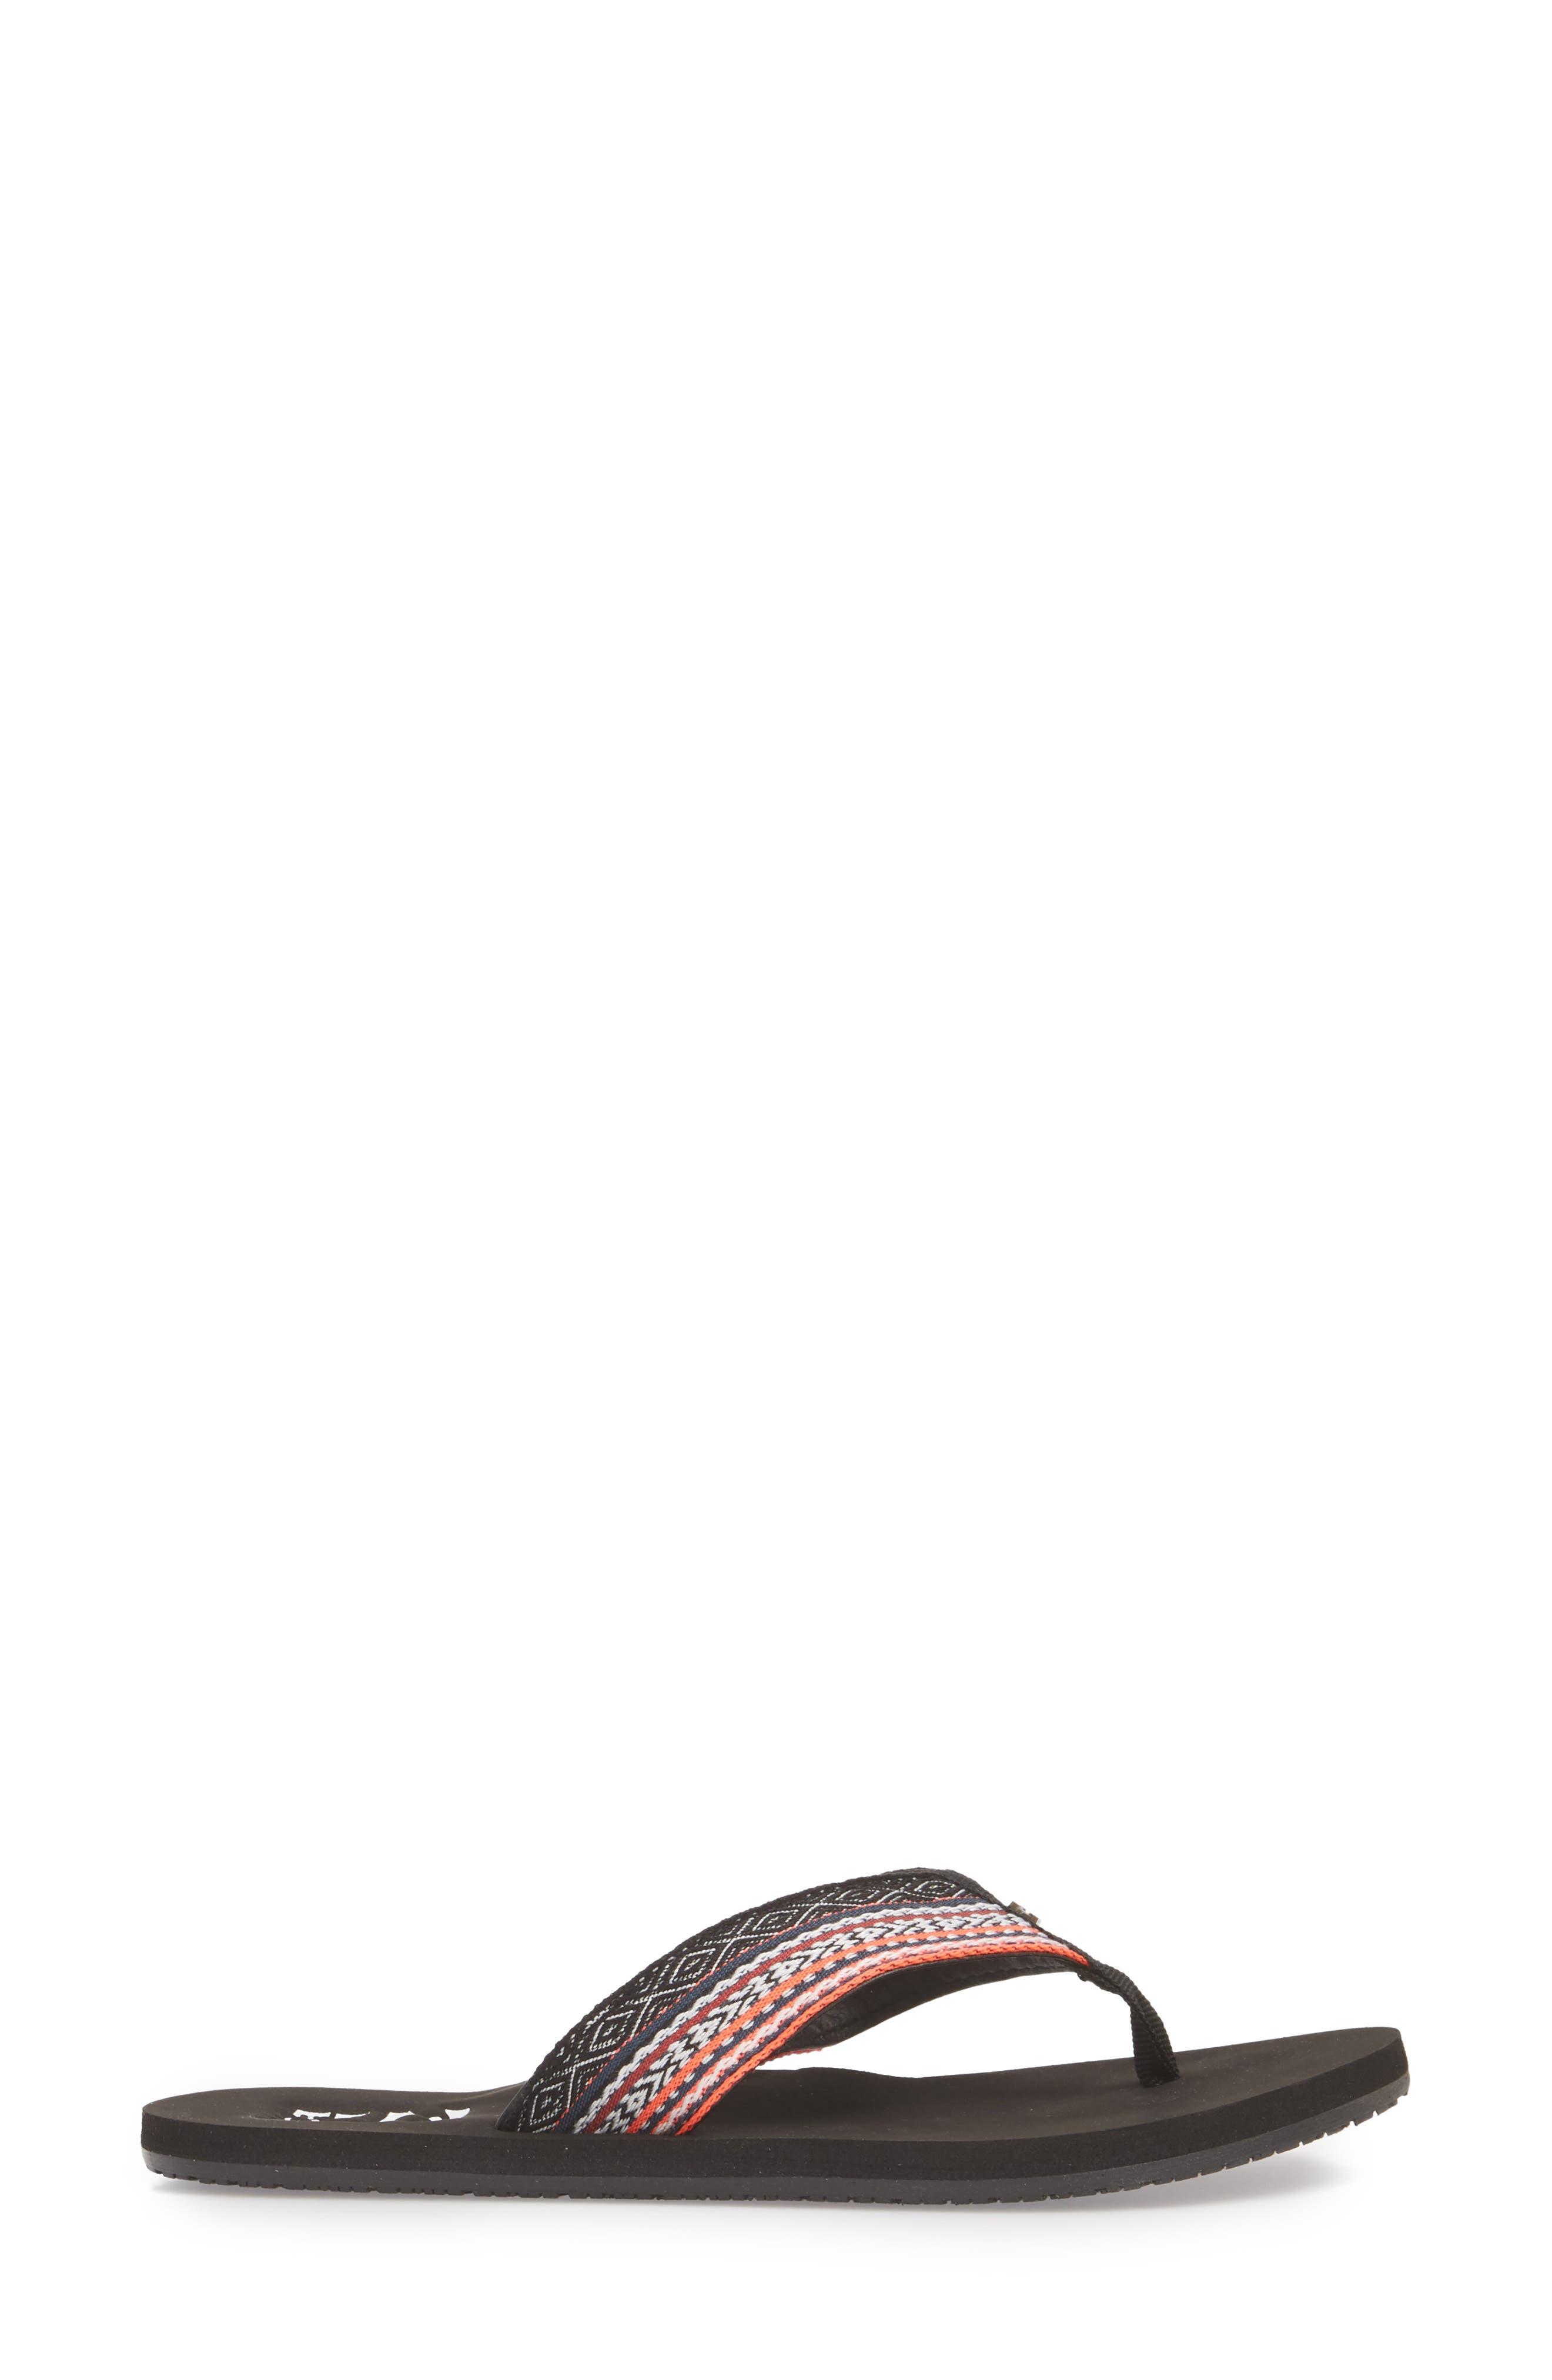 Baja Flip Flop,                             Alternate thumbnail 3, color,                             BLACK CORAL